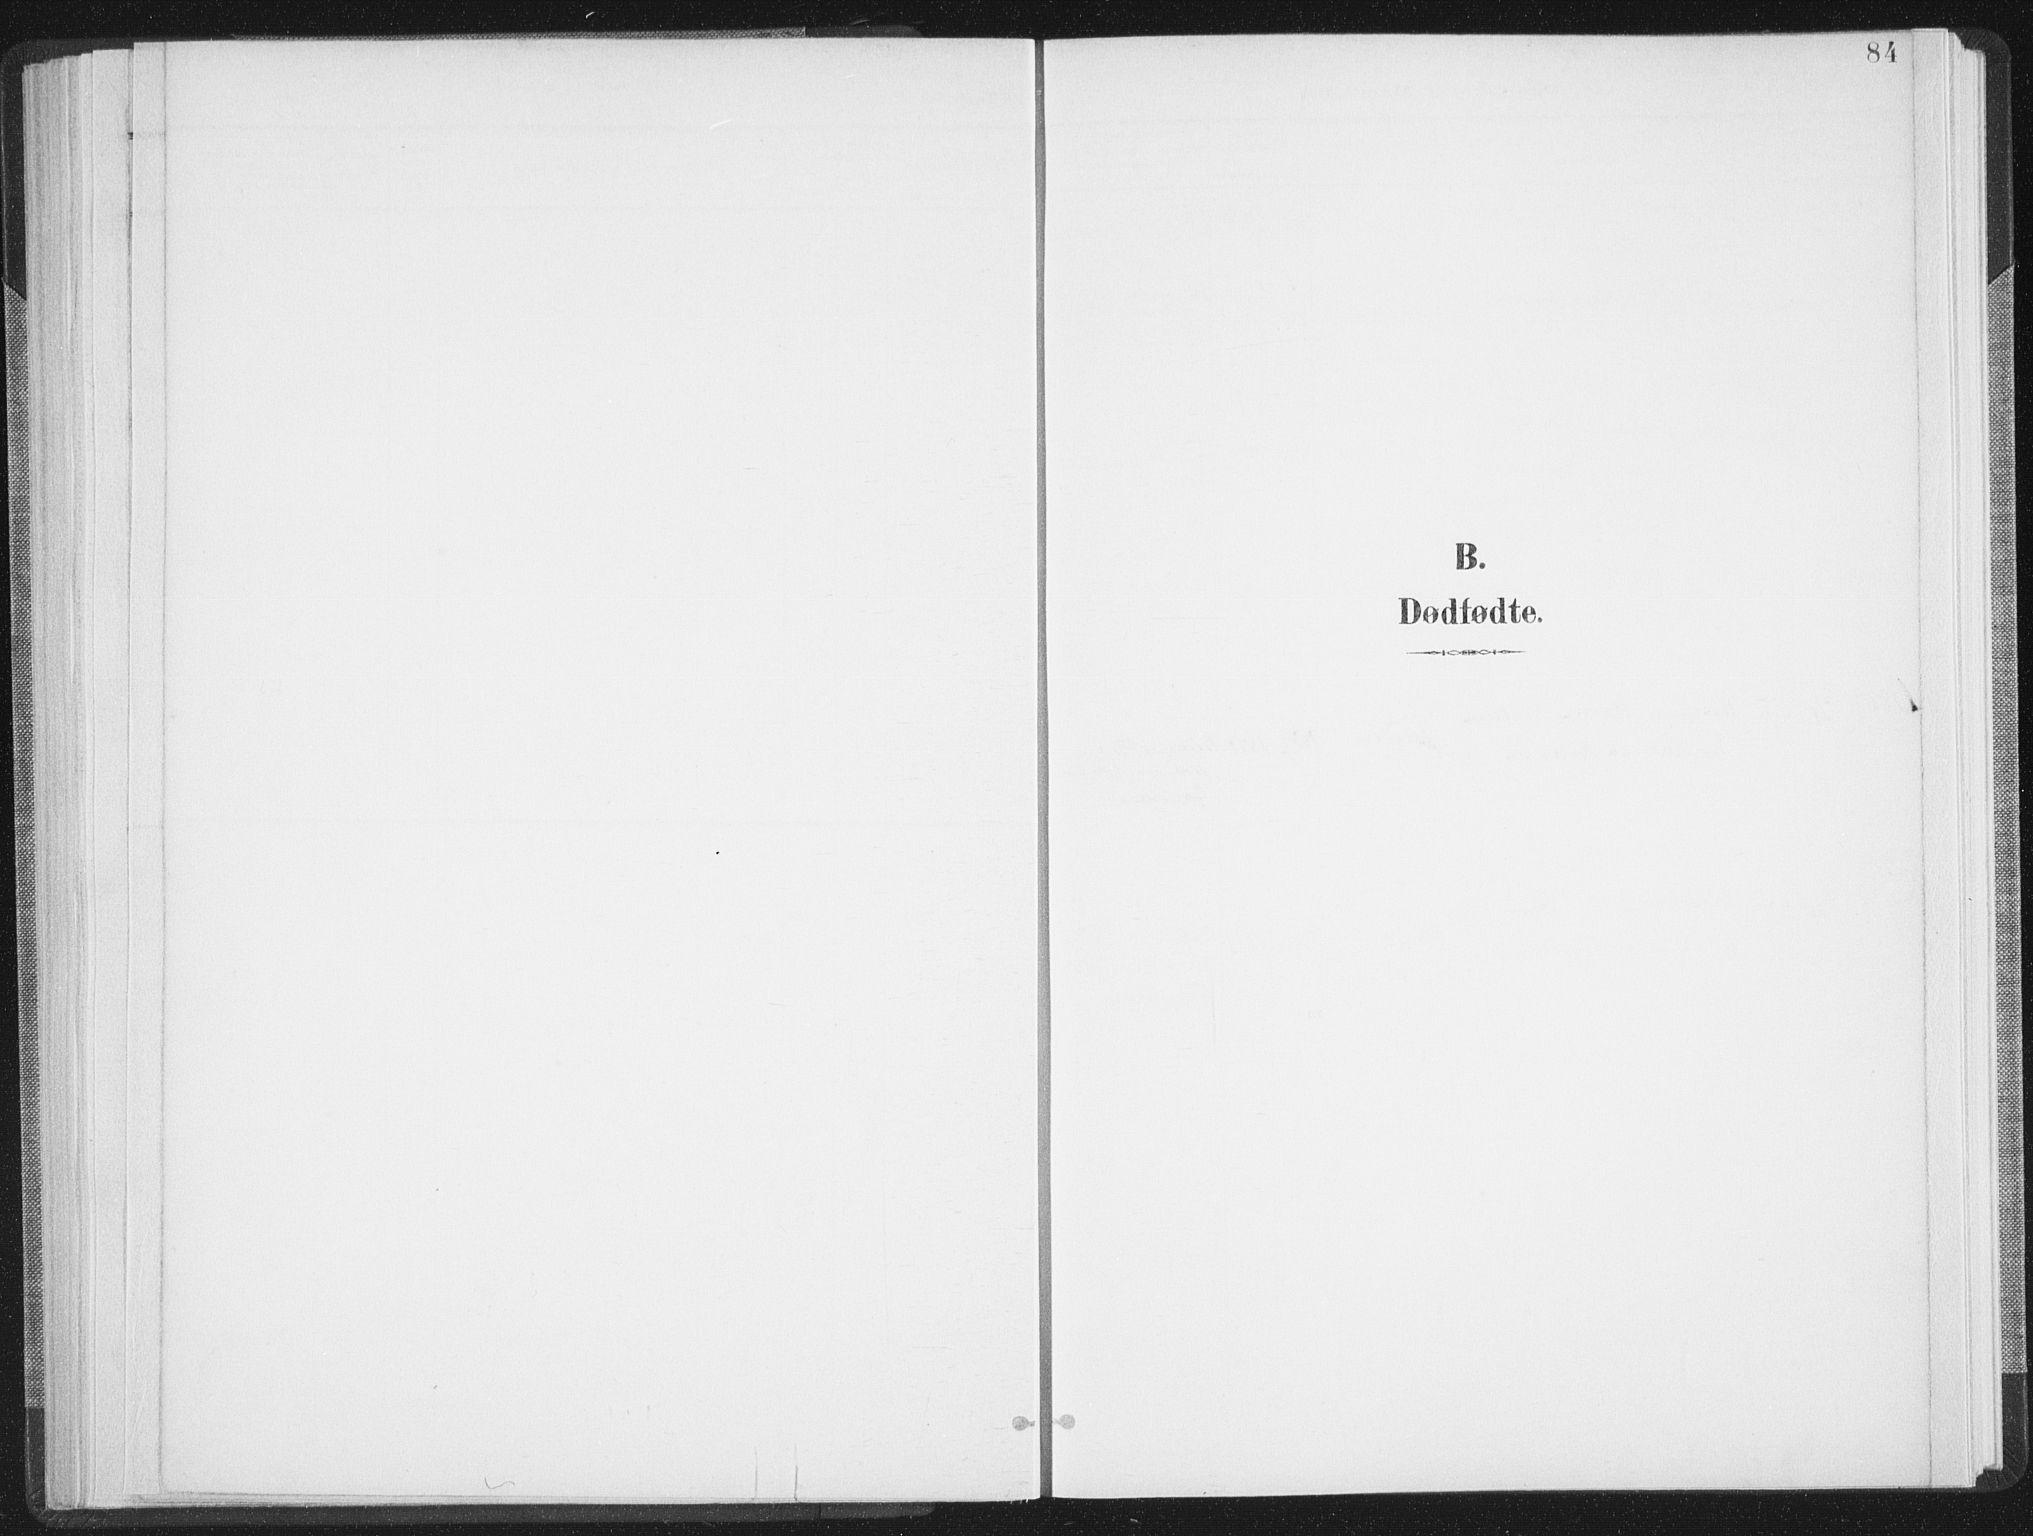 SAT, Ministerialprotokoller, klokkerbøker og fødselsregistre - Nordland, 897/L1400: Ministerialbok nr. 897A07, 1897-1908, s. 84